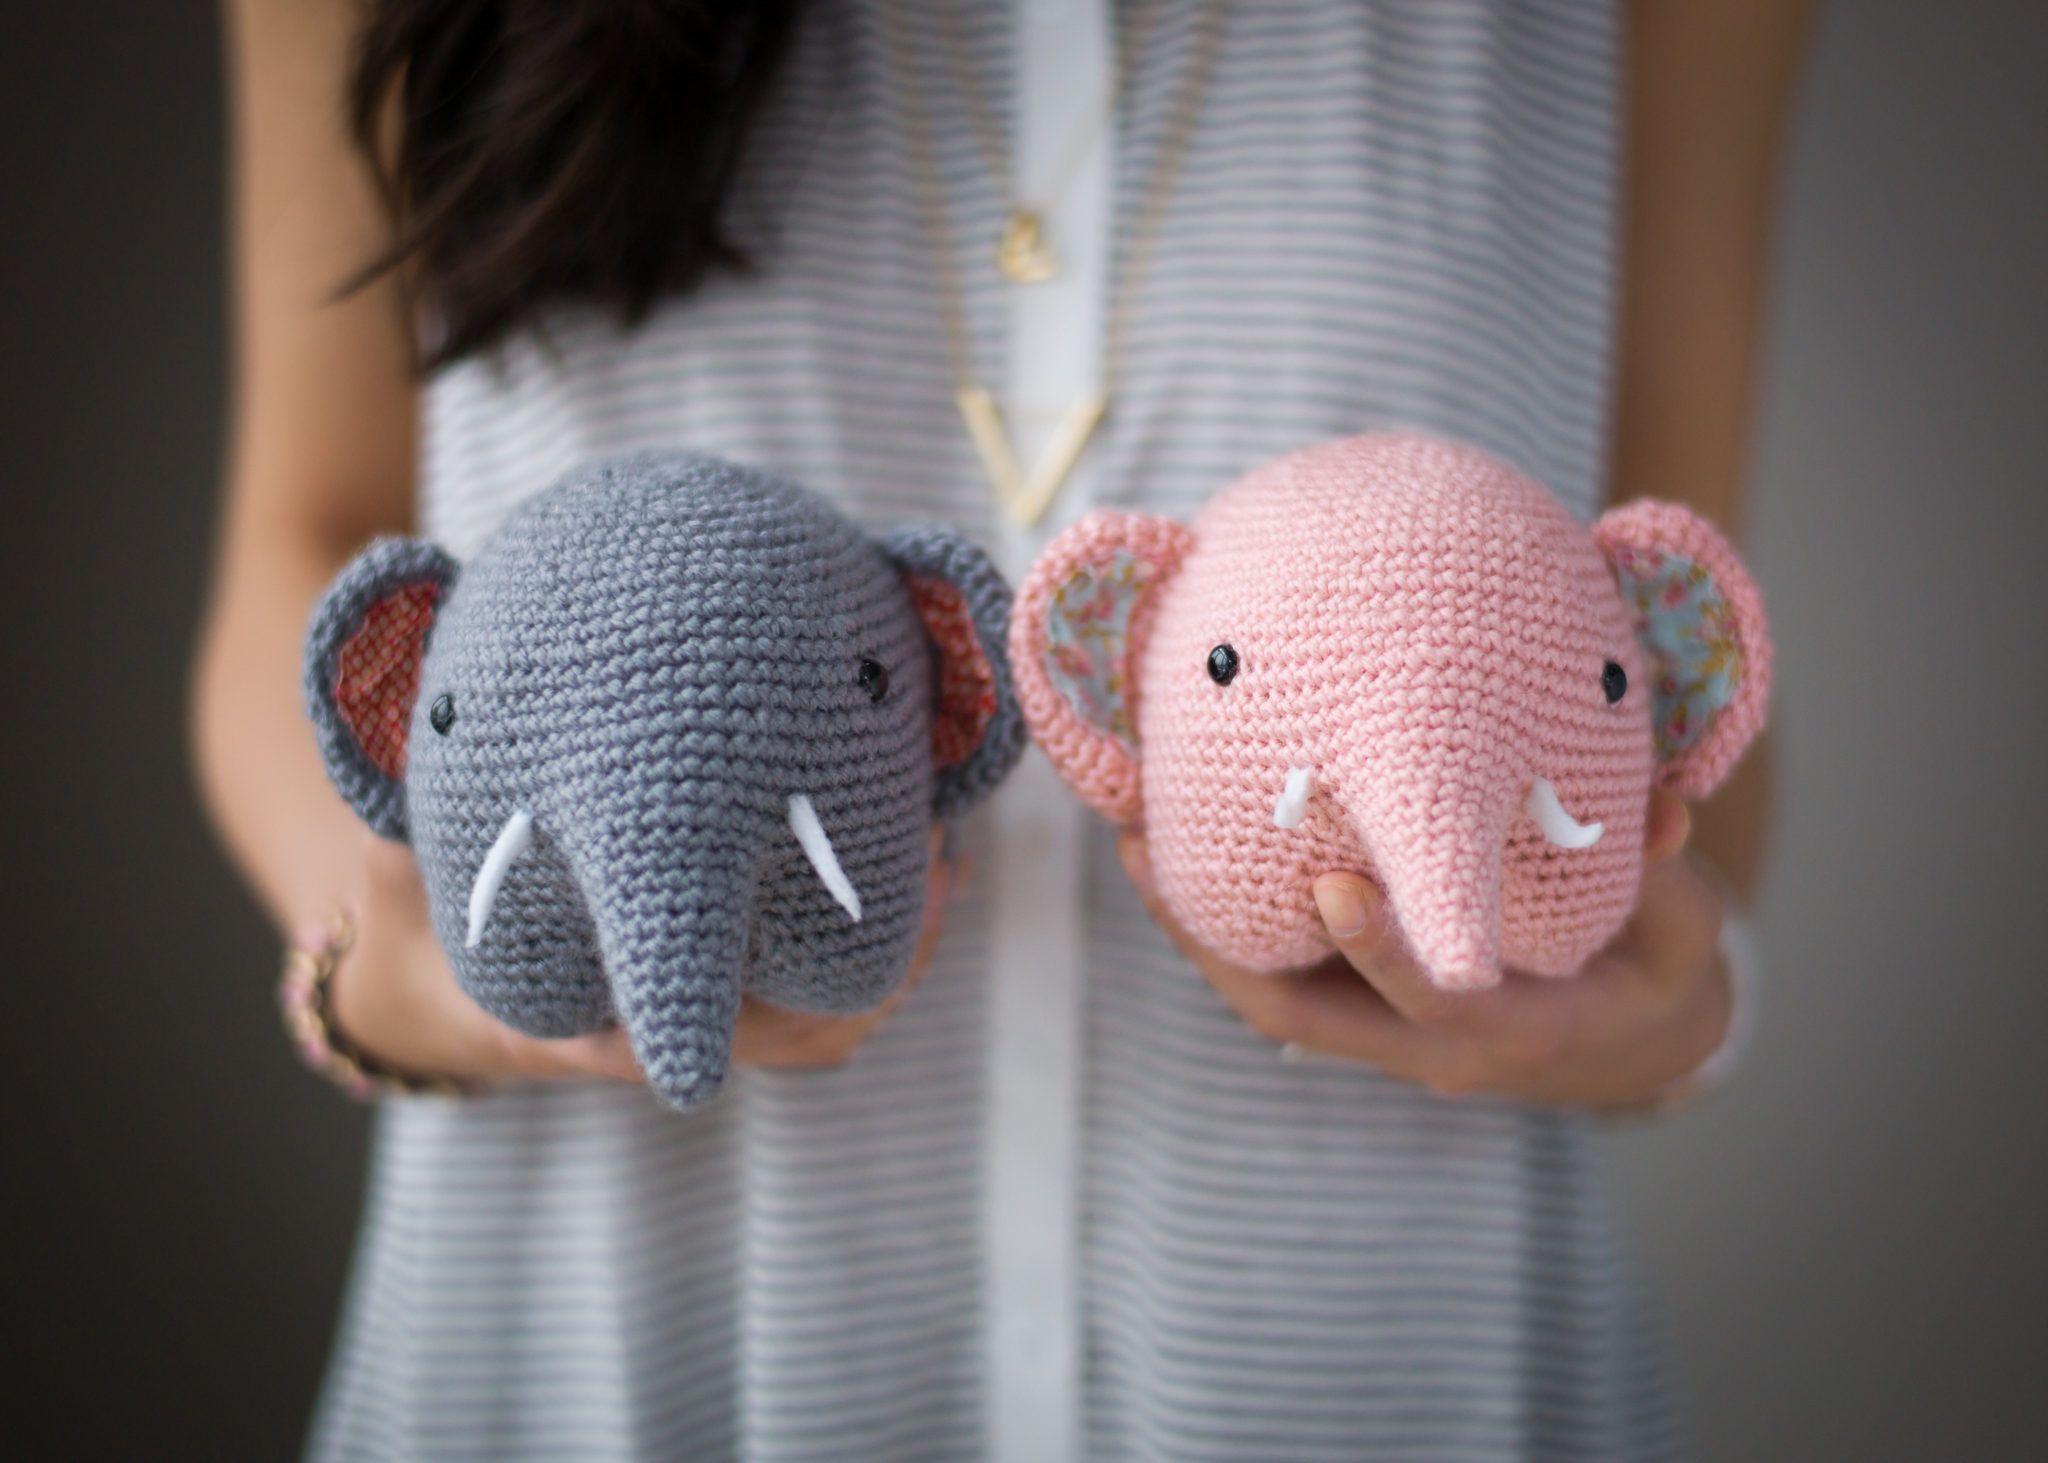 Amigurumi Patterns Elephant : Pattern elephant amigurumi crochet and patterns